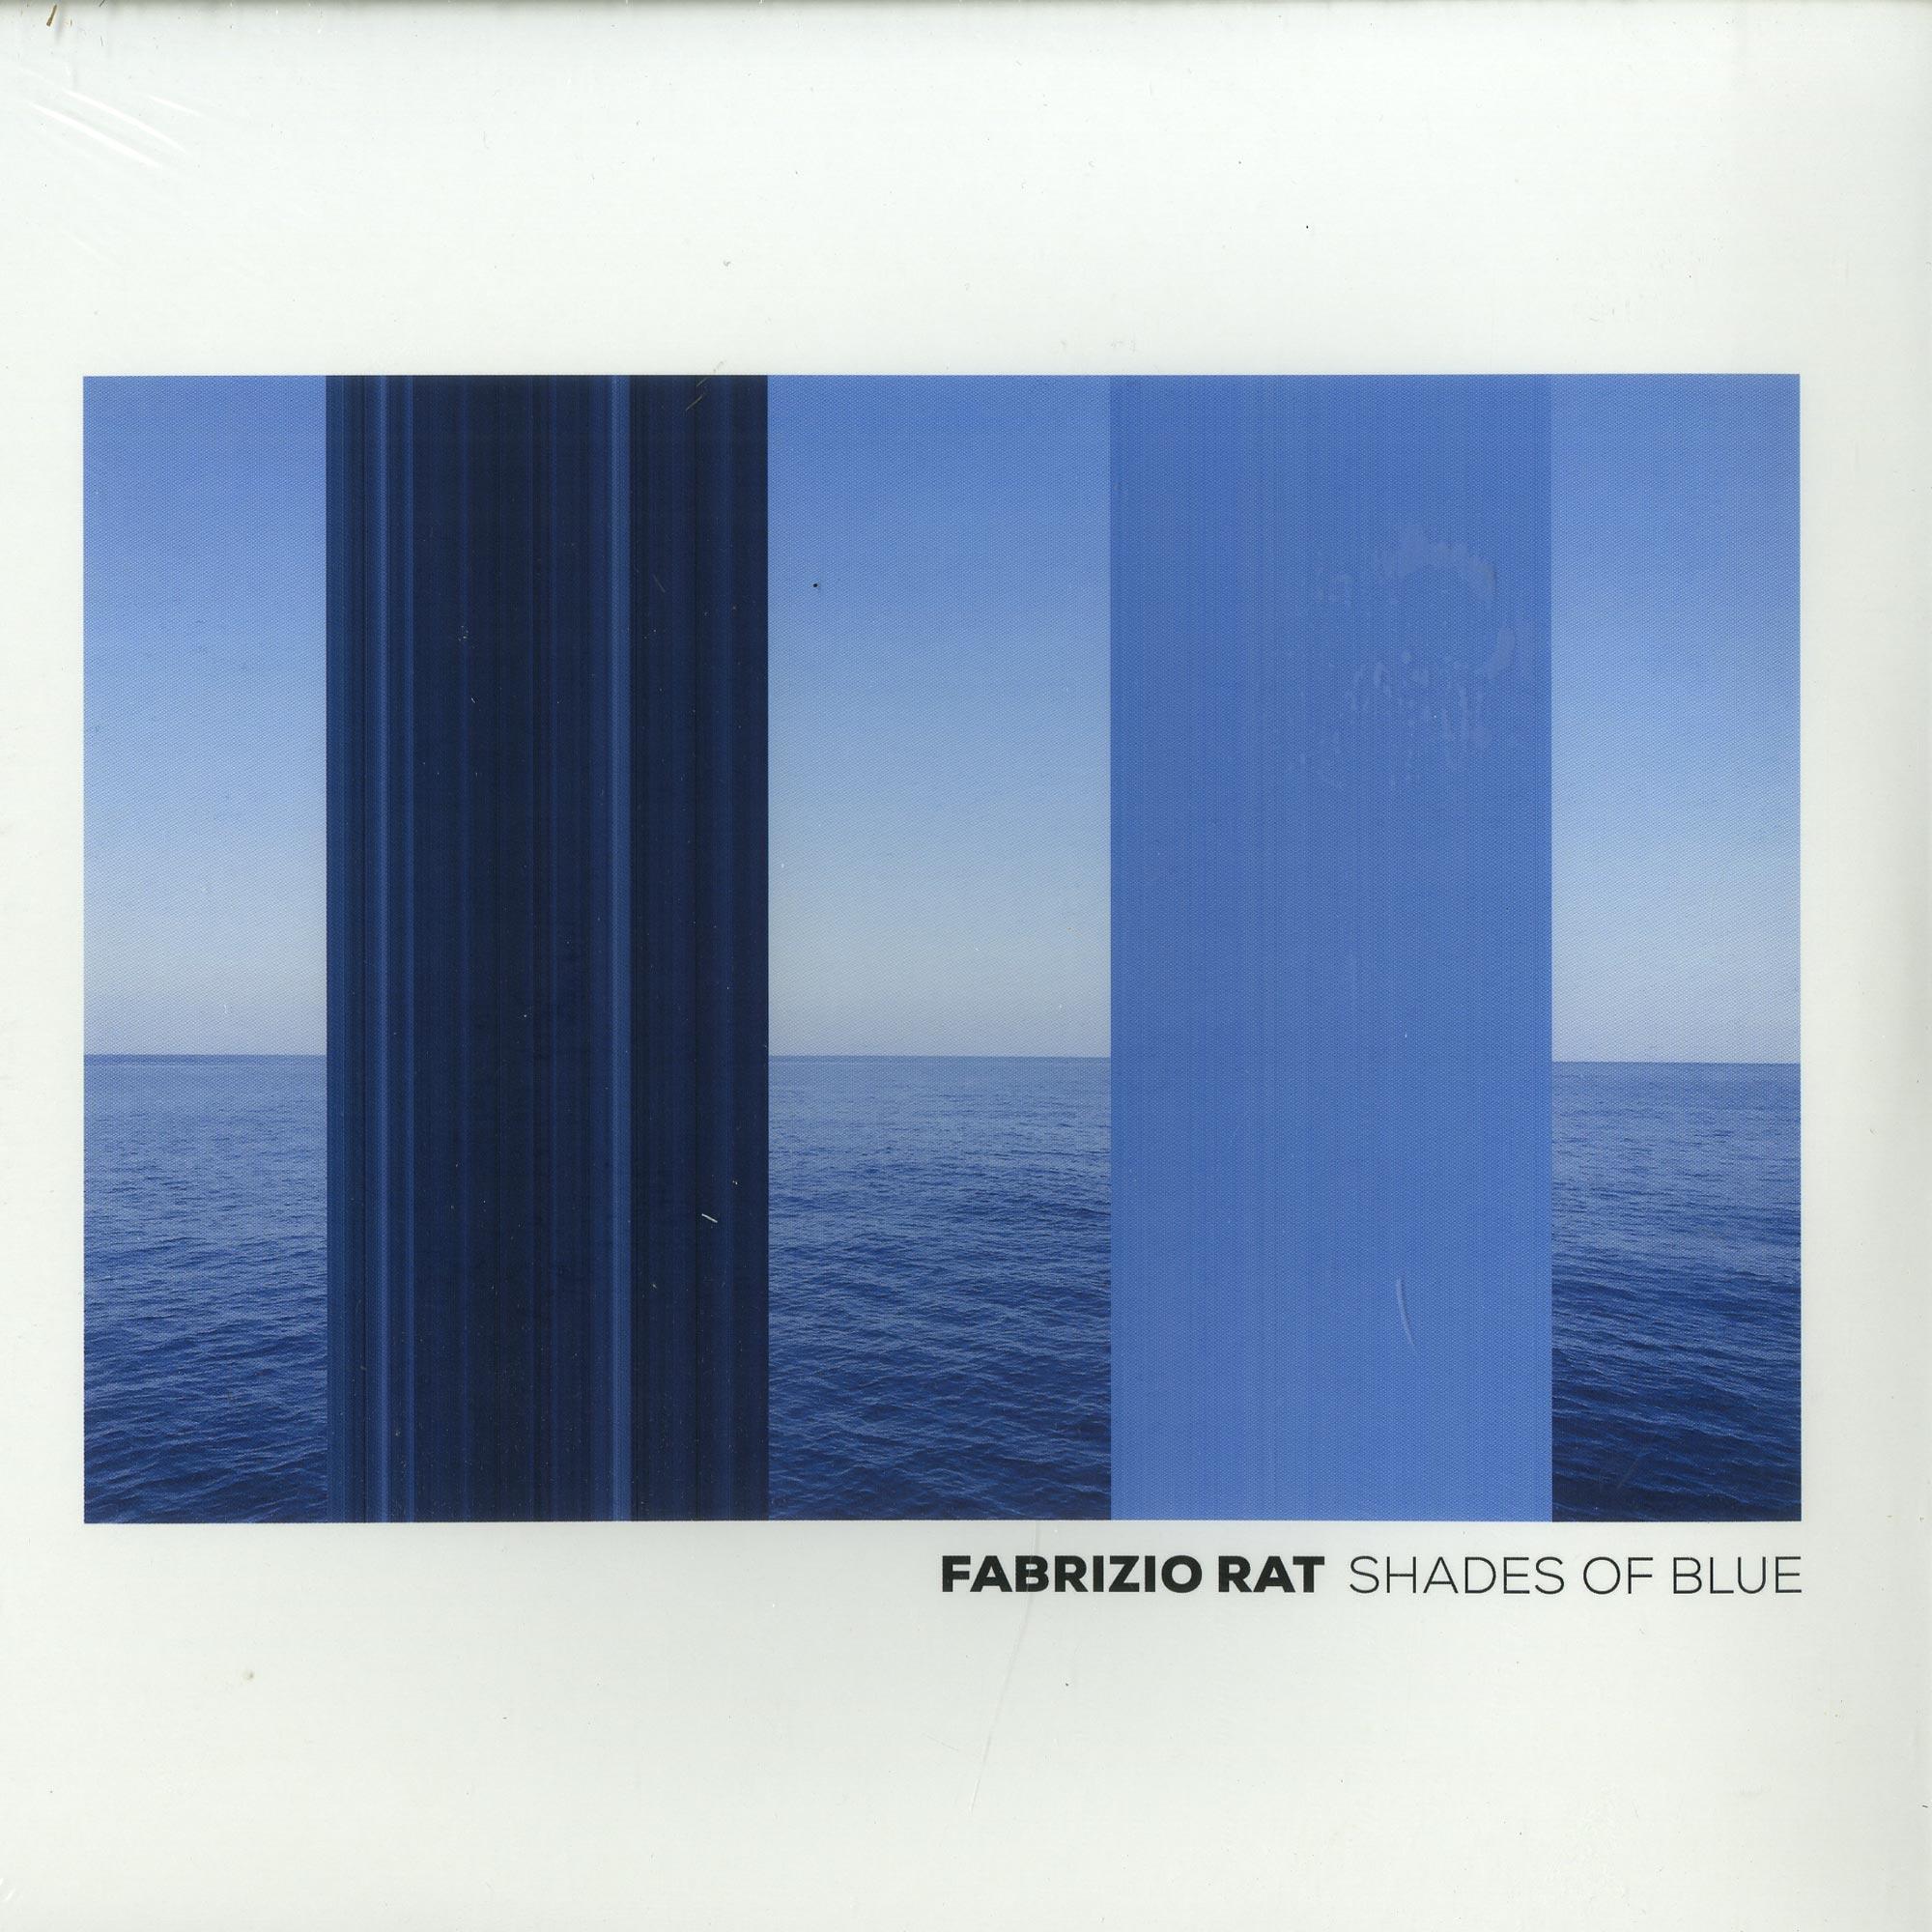 Fabrizio Rat - SHADES OF BLUE